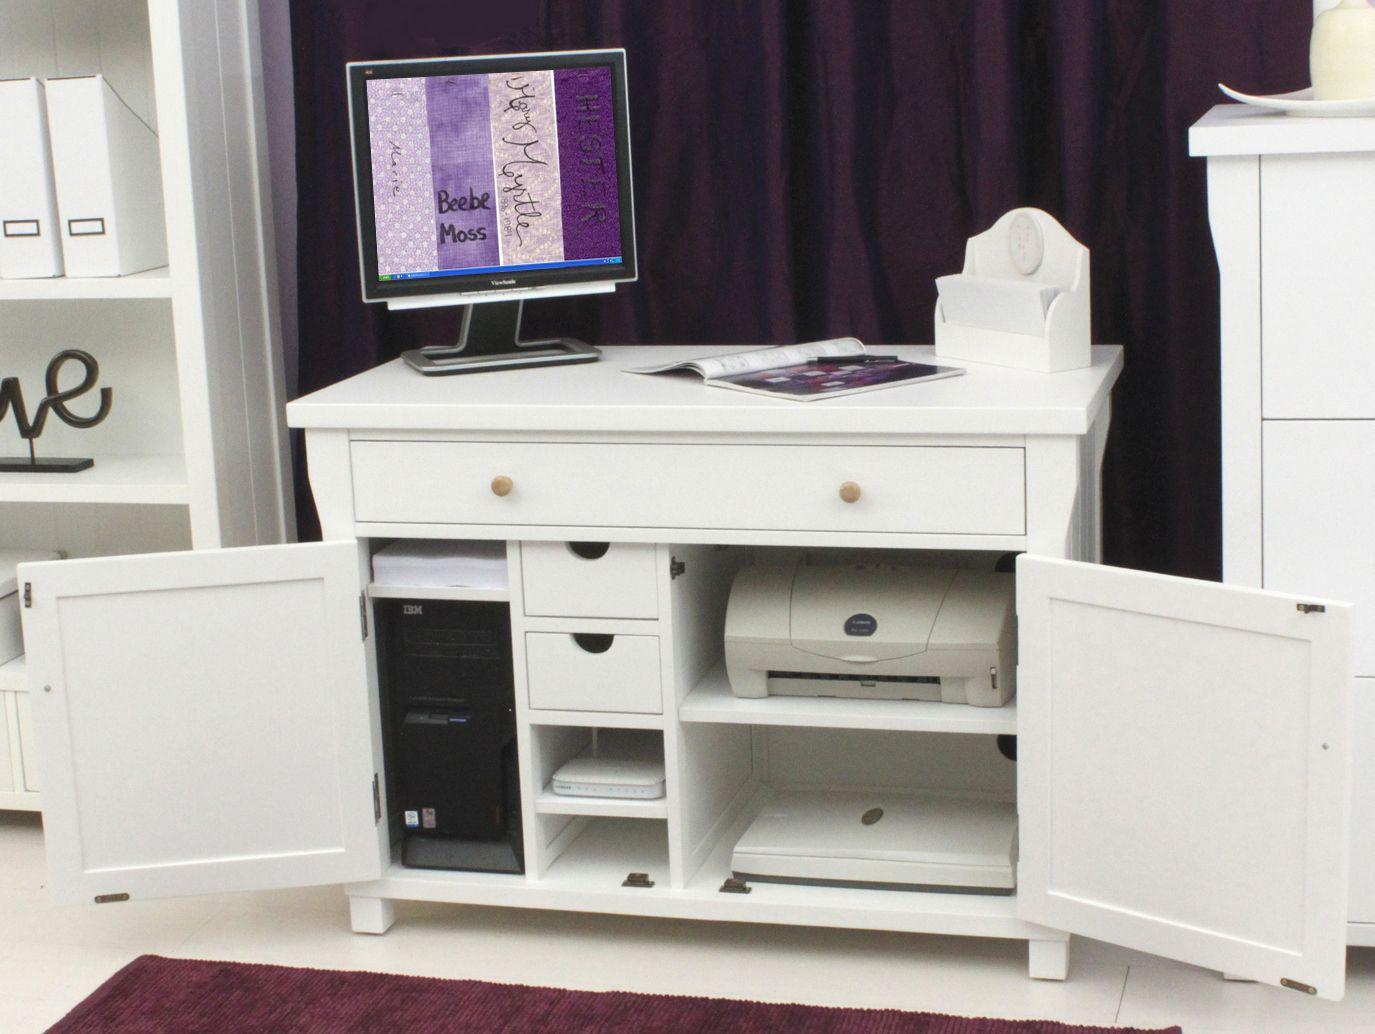 hide away furniture. Hideaway Desks Home Office - City Furniture Living Room Set Check More At Http:/ Hide Away